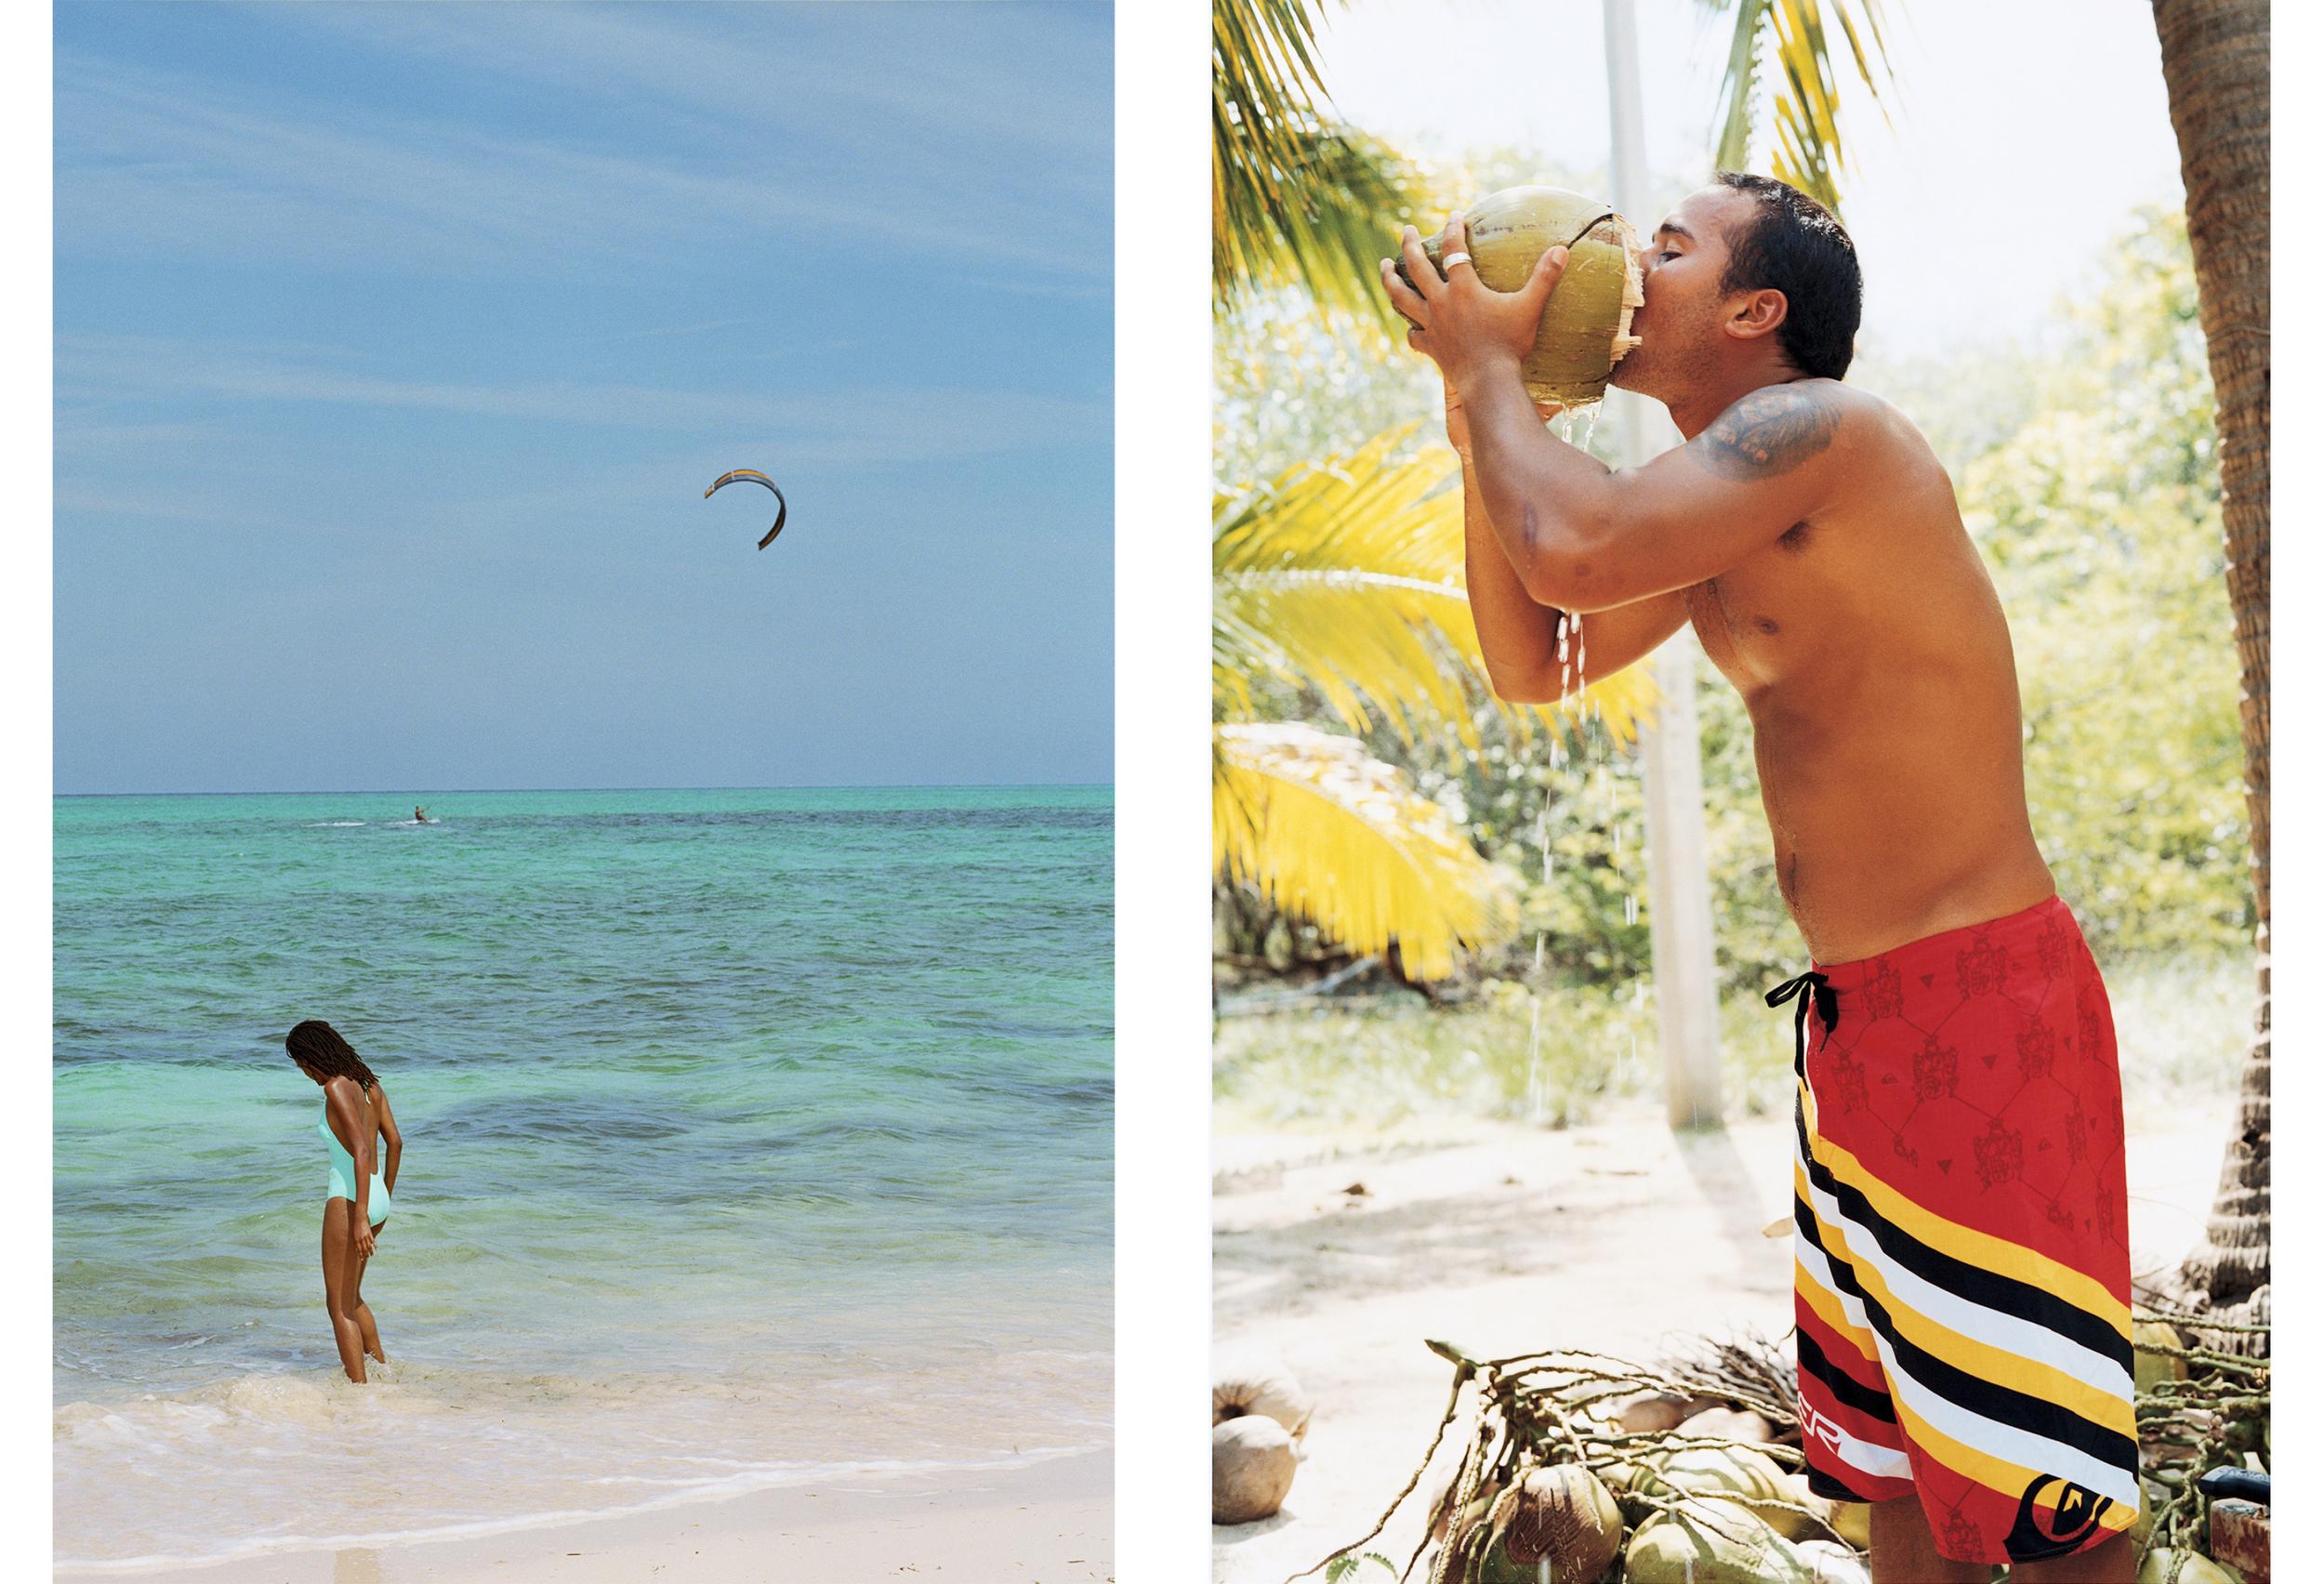 Bahamas_Lifestyle_spread.jpg